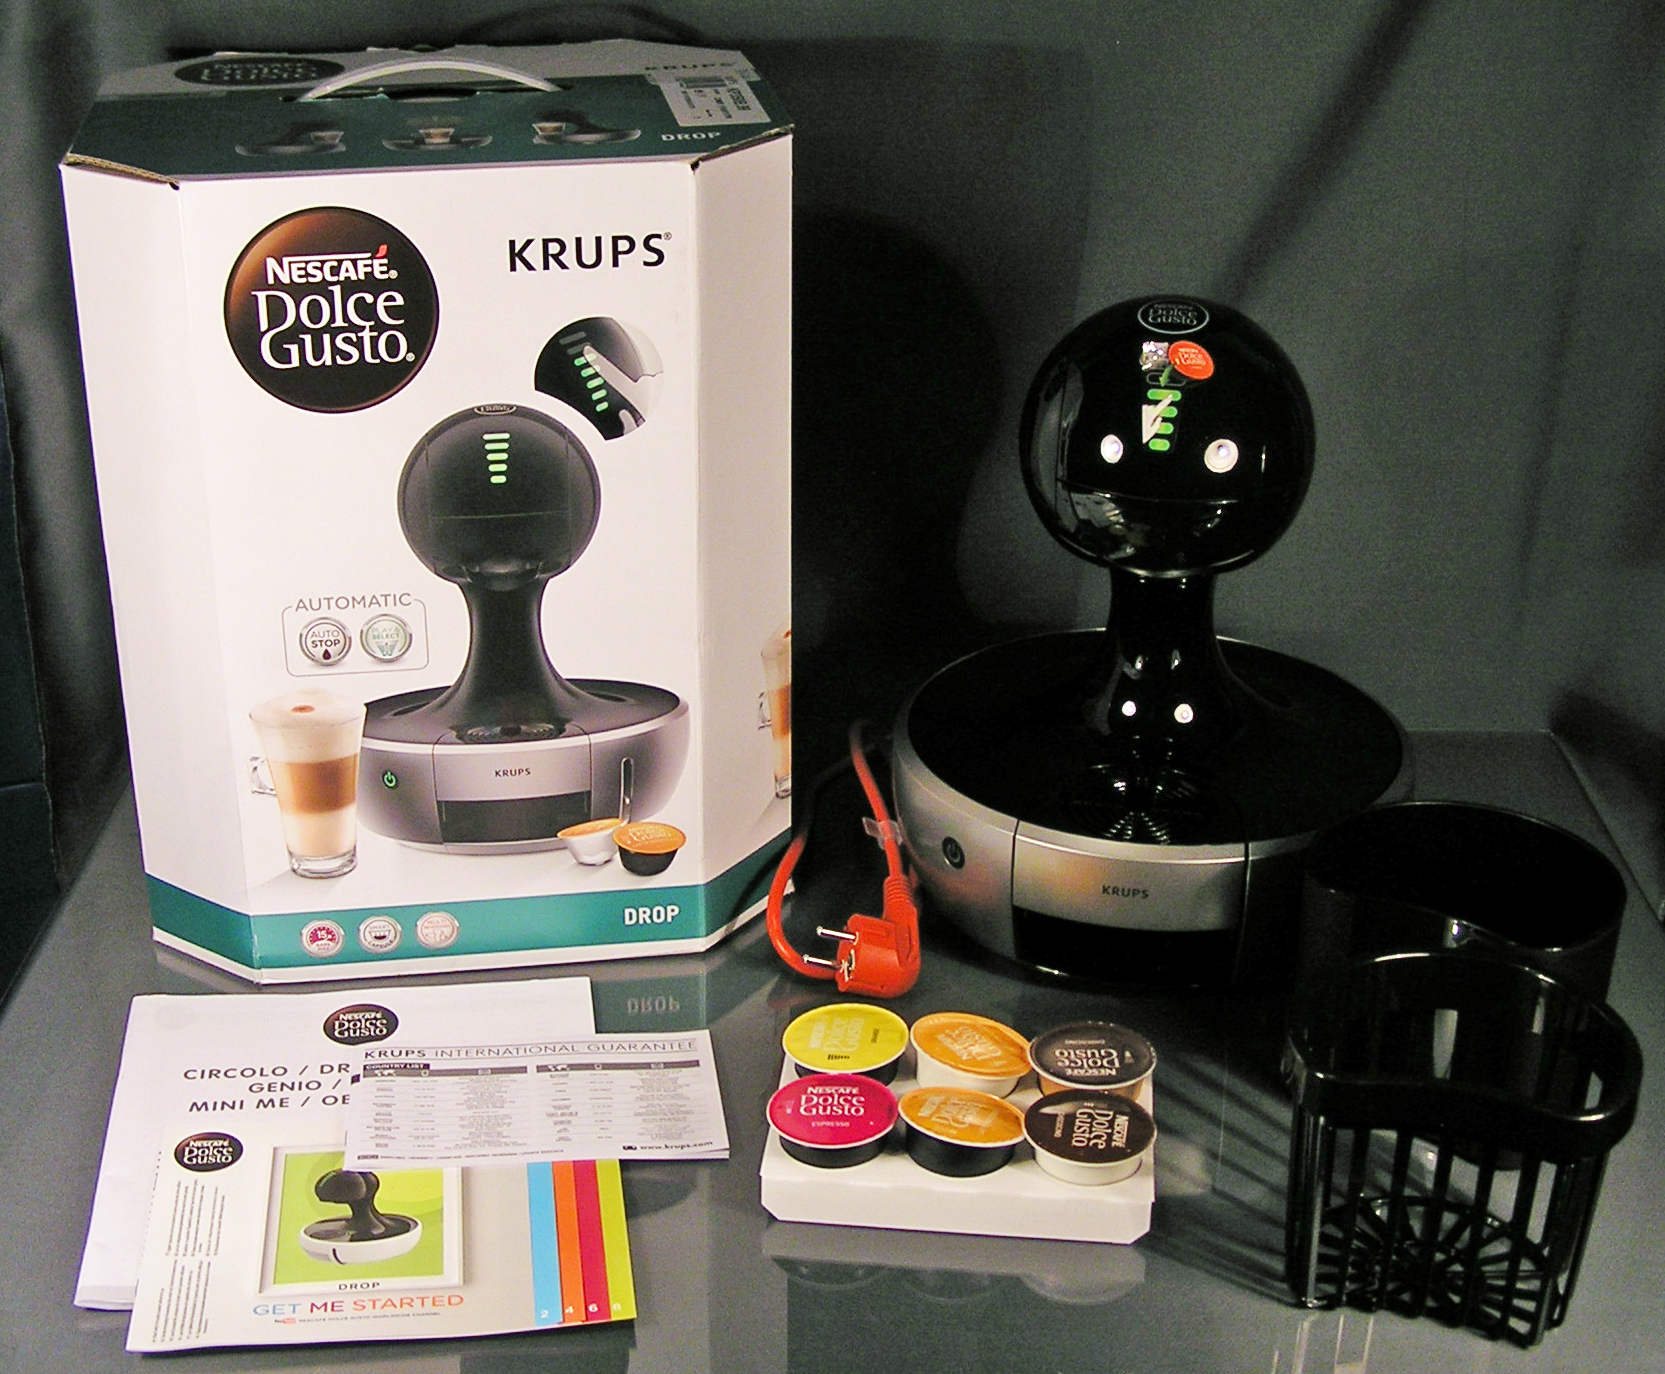 krups drop automatic schwarz silb kp350b nescaf dolce. Black Bedroom Furniture Sets. Home Design Ideas